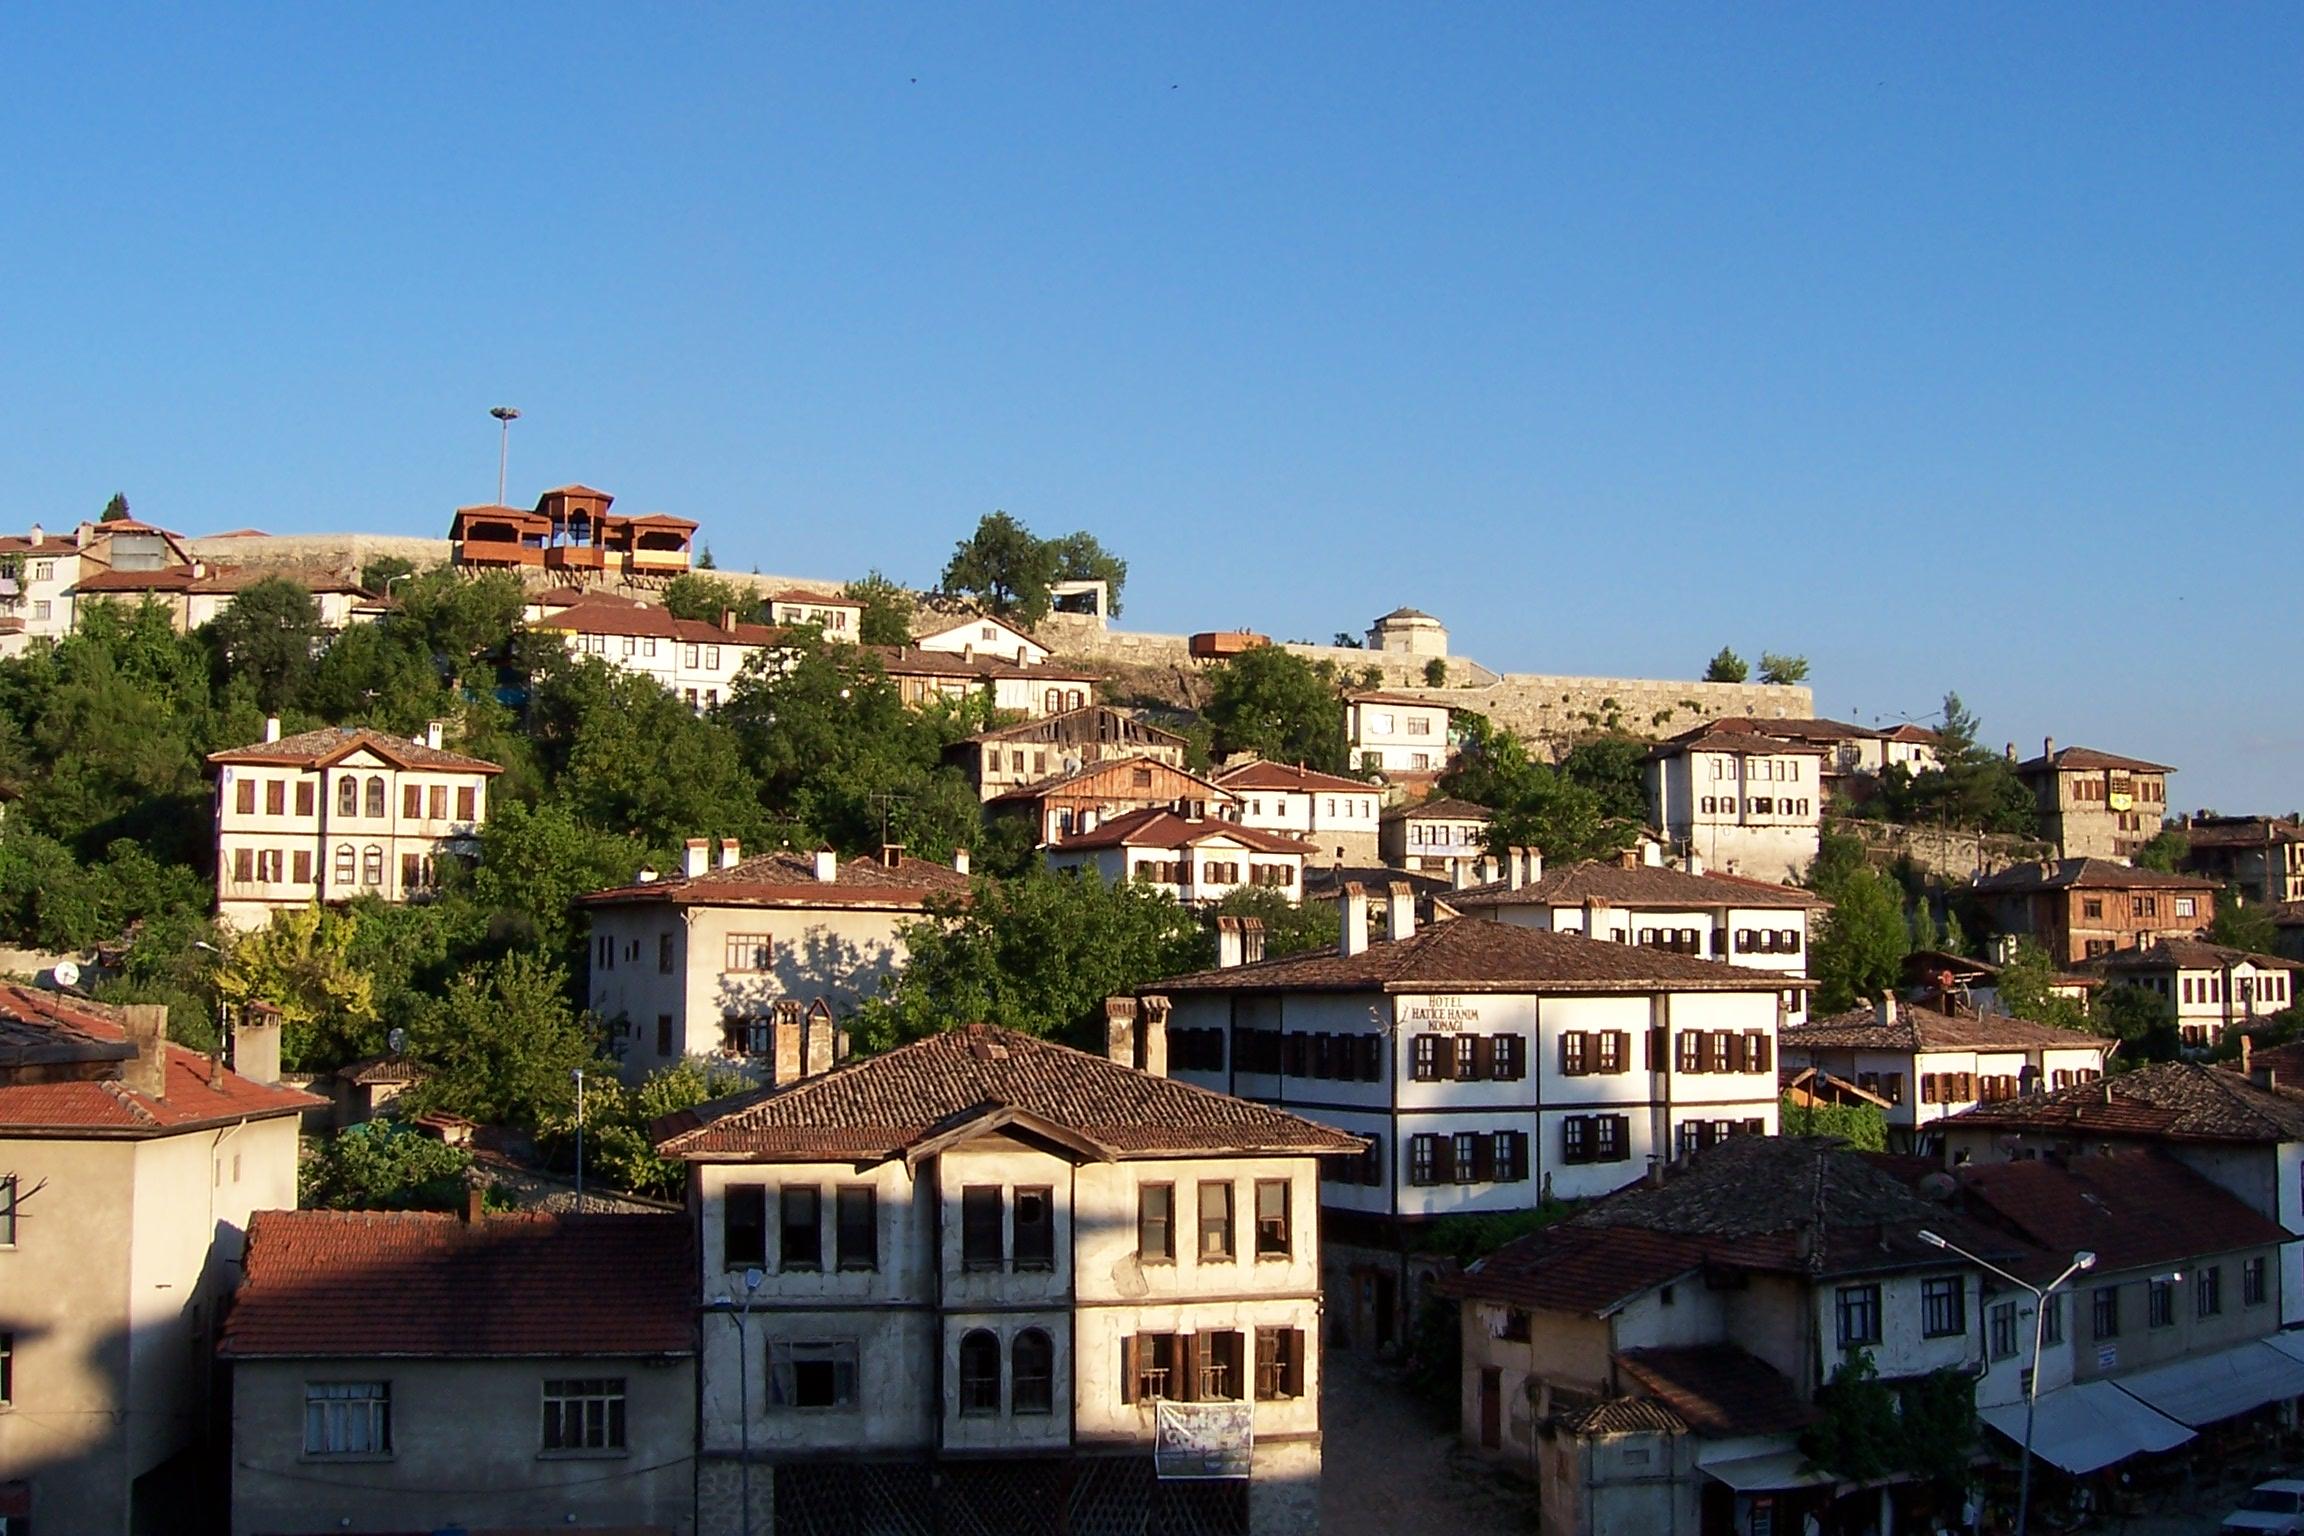 safranbolu-traditional-houses.jpg